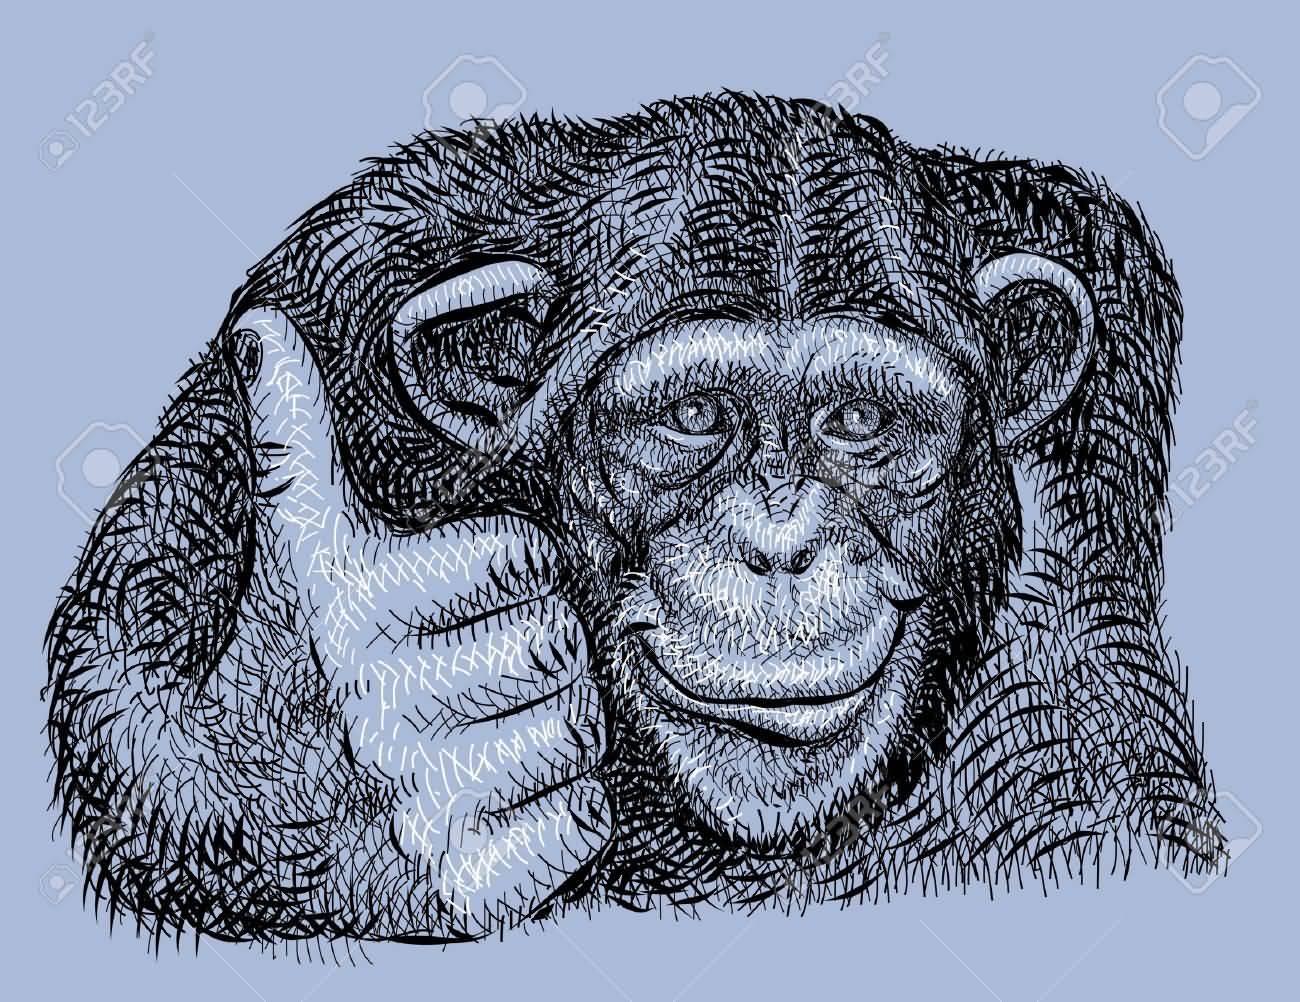 9 Chimpanzee Tattoo Designs